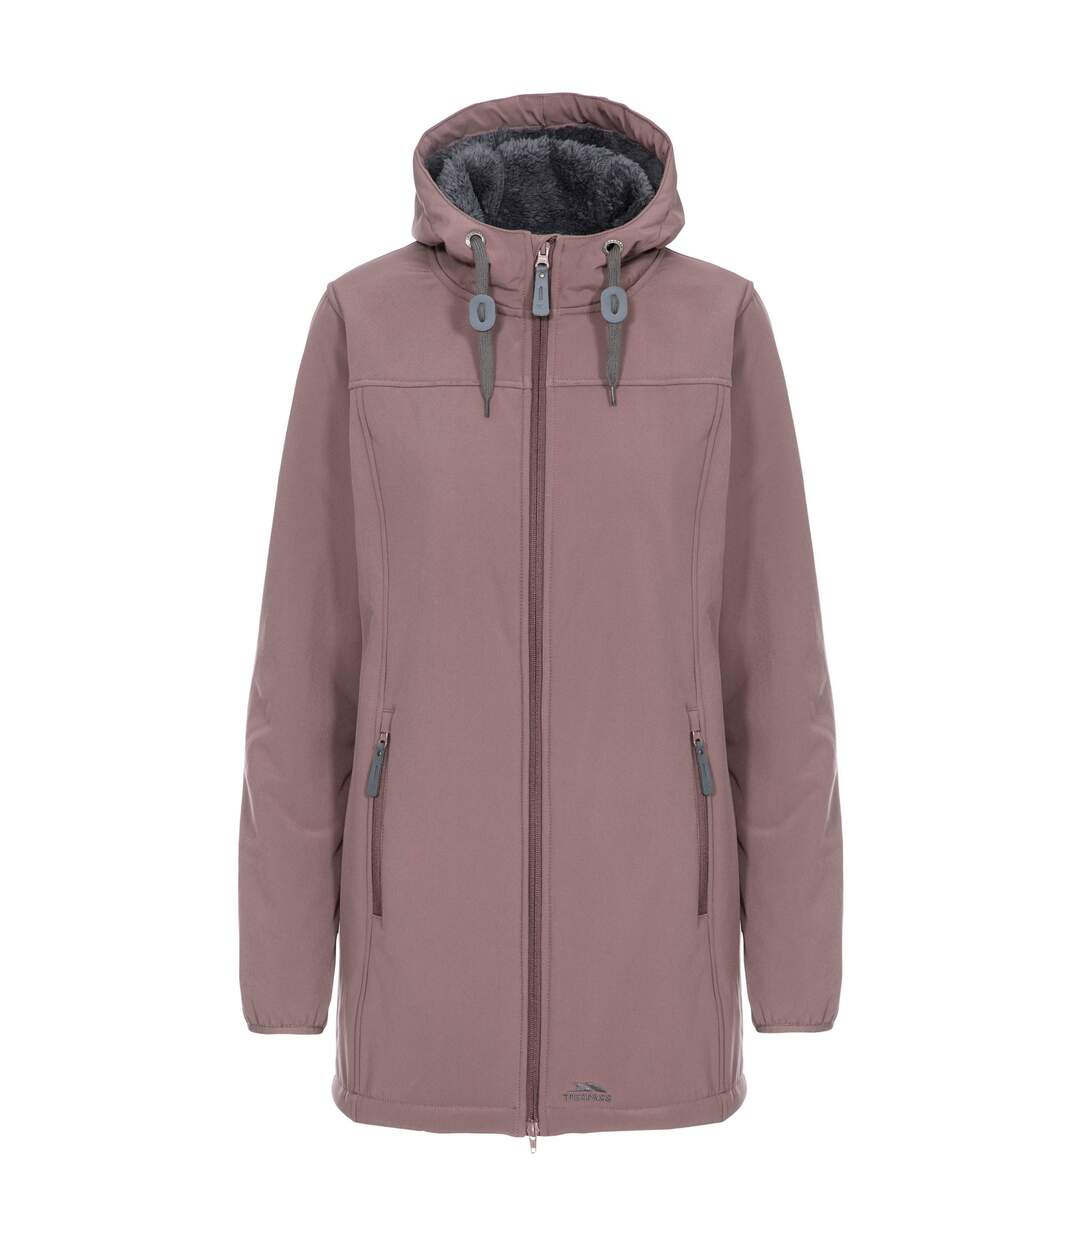 Trespass Womens/Ladies Kristen Longer Length Hooded Waterproof Jacket (Dusty Heather) - UTTP4195